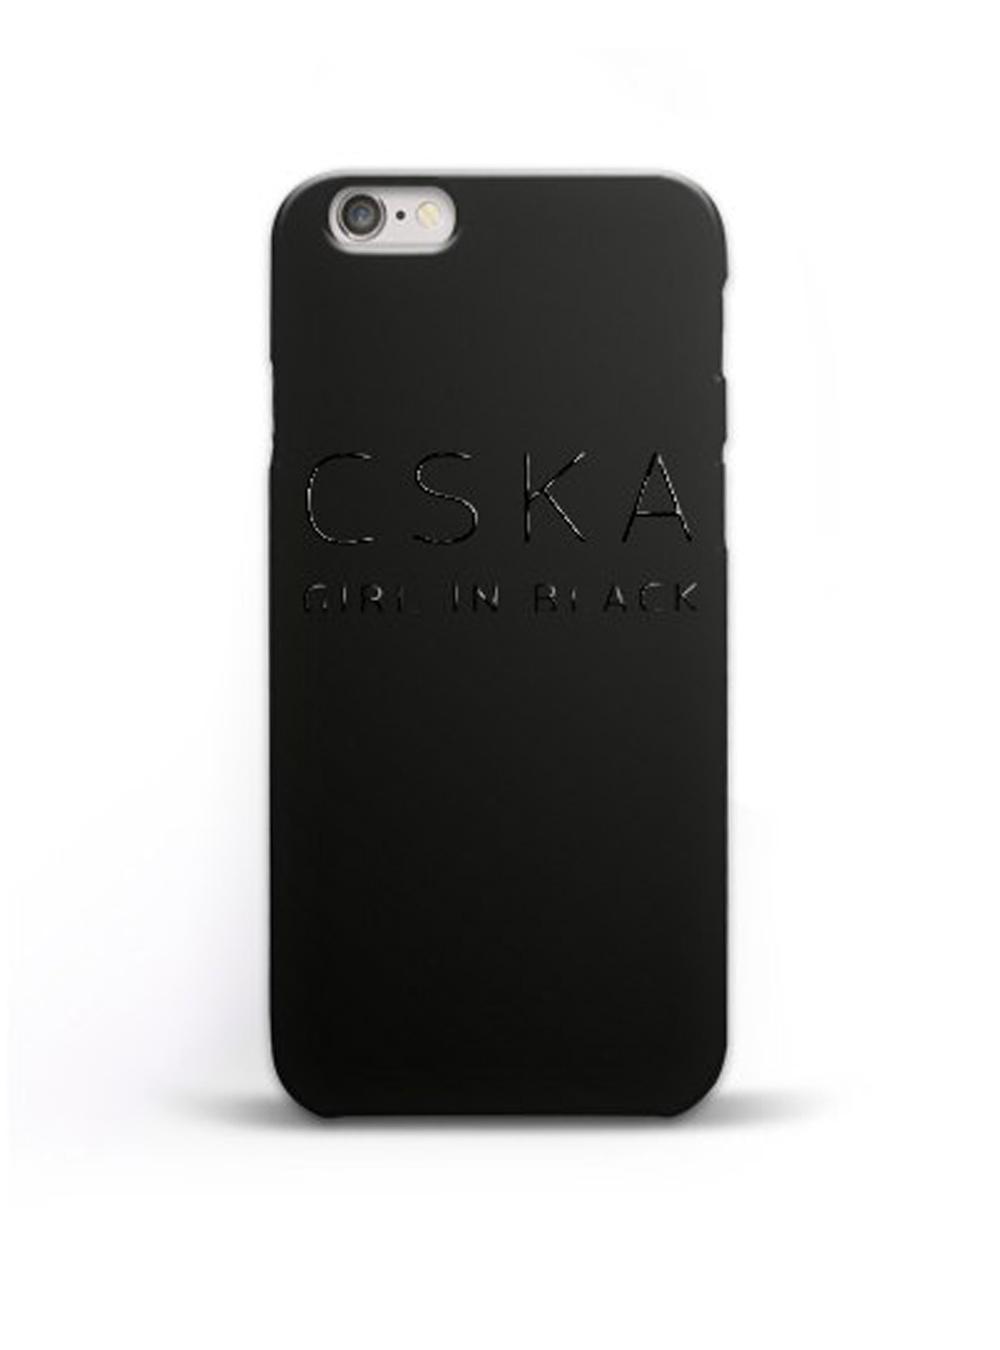 Клип-кейс CSKA GIRL IN BLACK для iPhone 5/5S , цвет черный